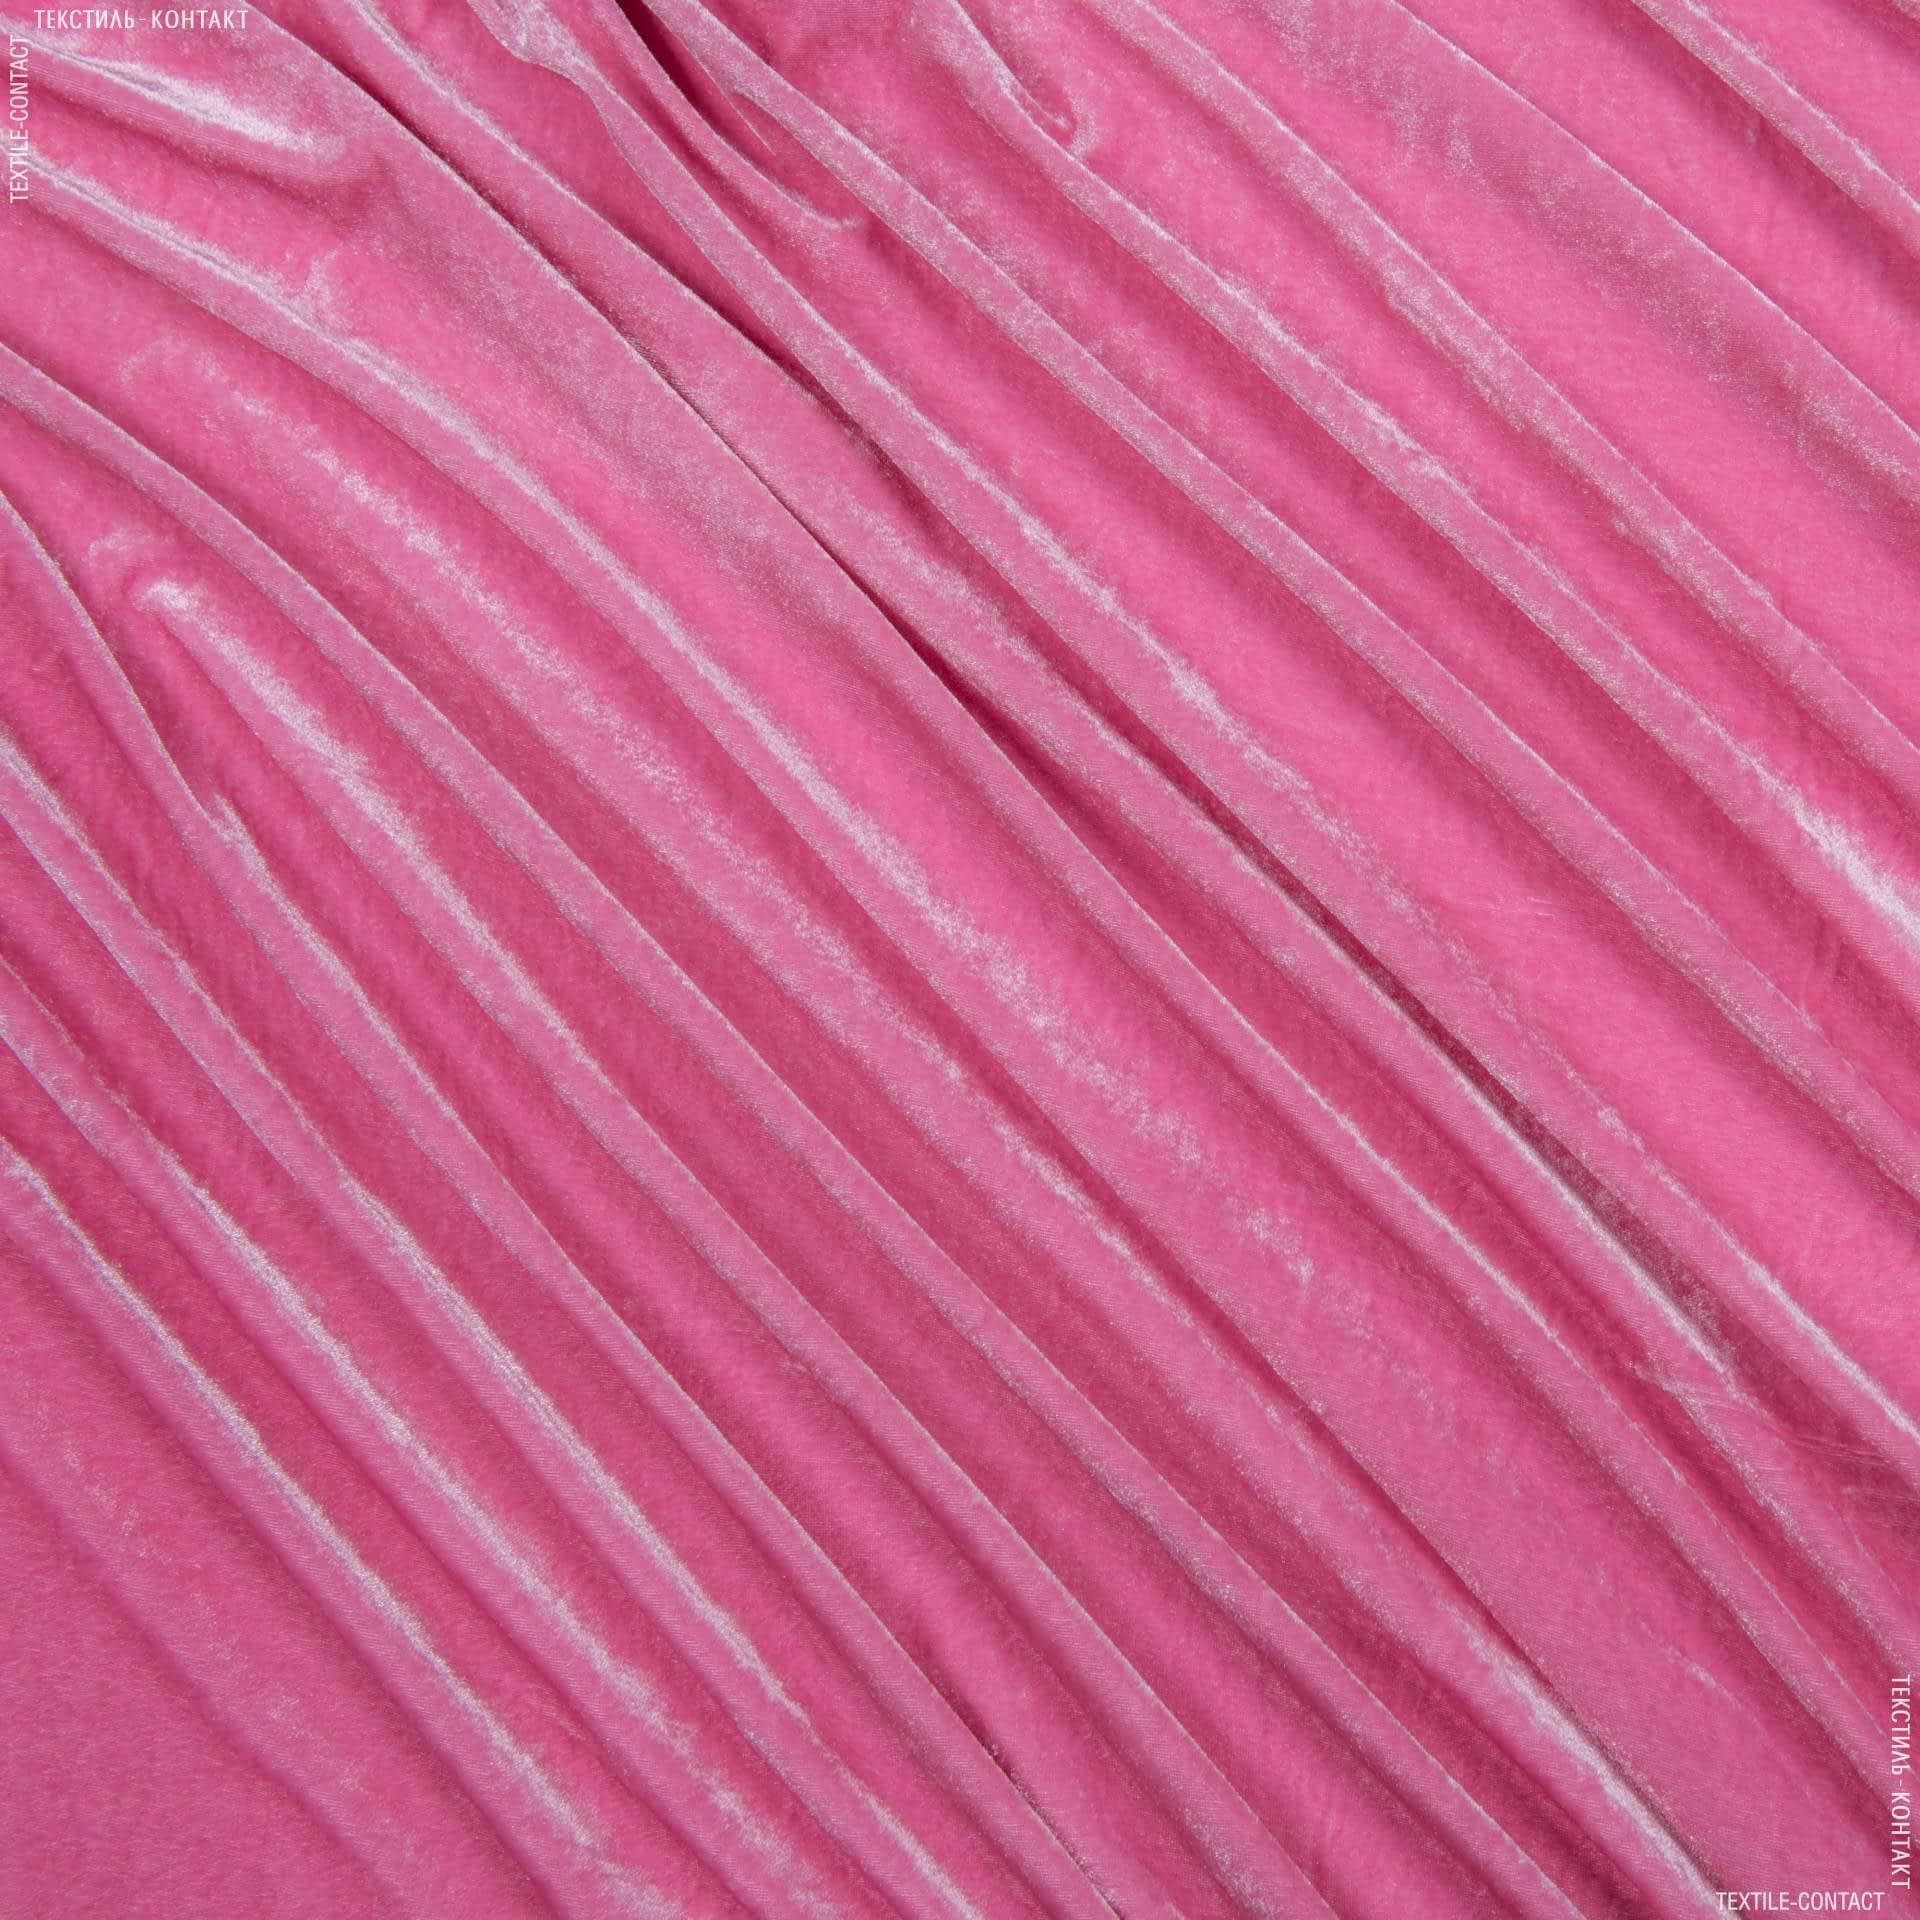 Тканини для суконь - Велюр стрейч рожевий